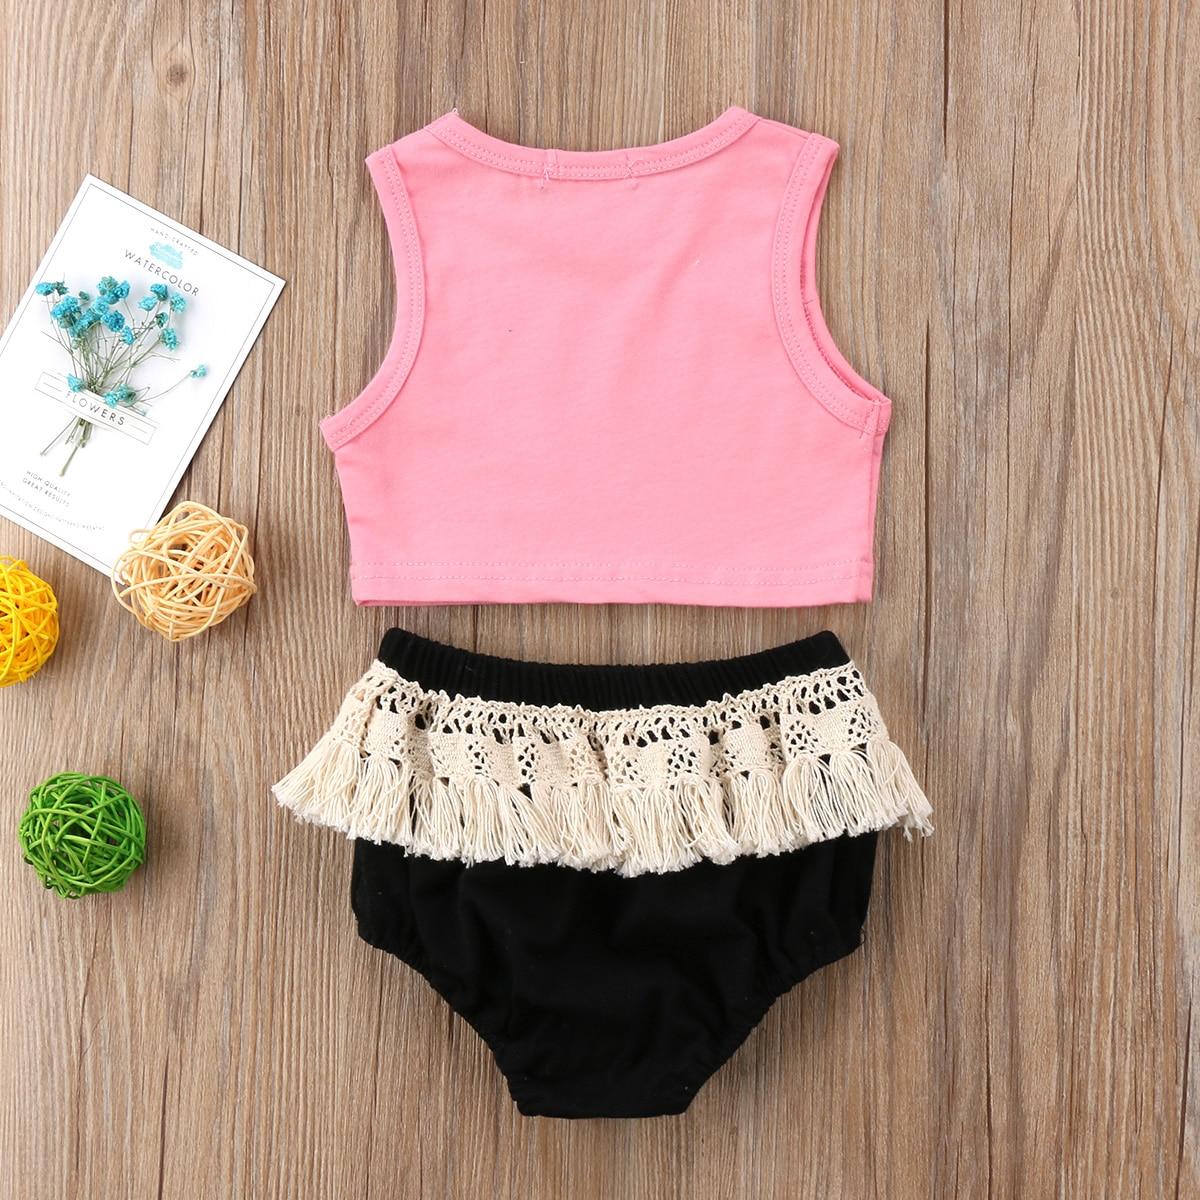 Girls' Baby Clothing Mother & Kids 2018 Newborn Kids Baby Girl T-shirt Vest Pineapple Tops+ruffle Shorts Pants Cotton Clothes 2pcs Cute Summer Set